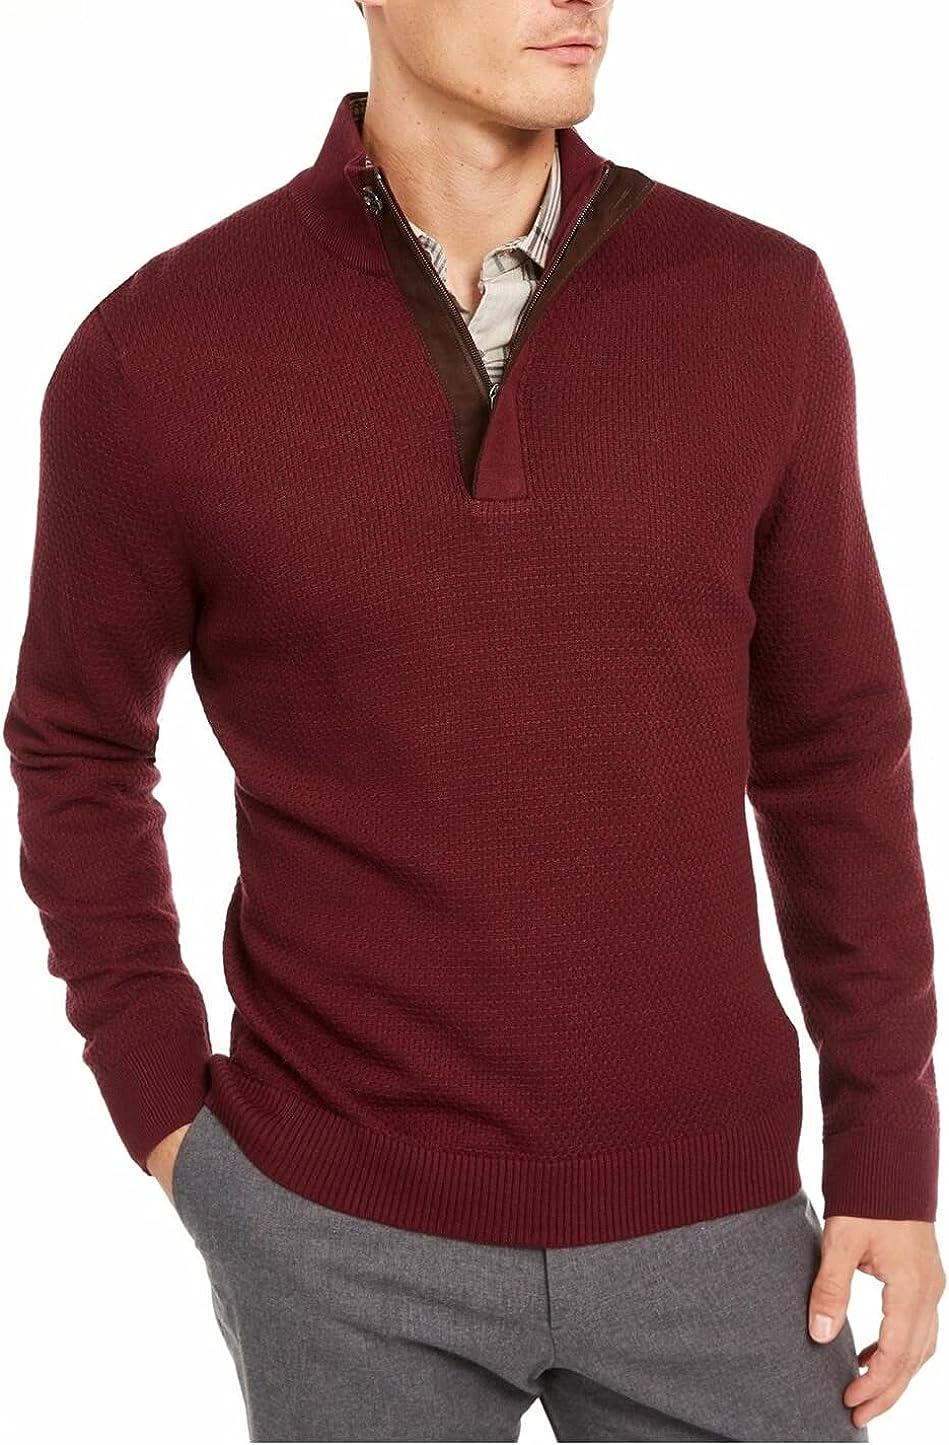 Tasso Elba Mens Sweater Plum Pullover Quarter-Zip Knit Red XL